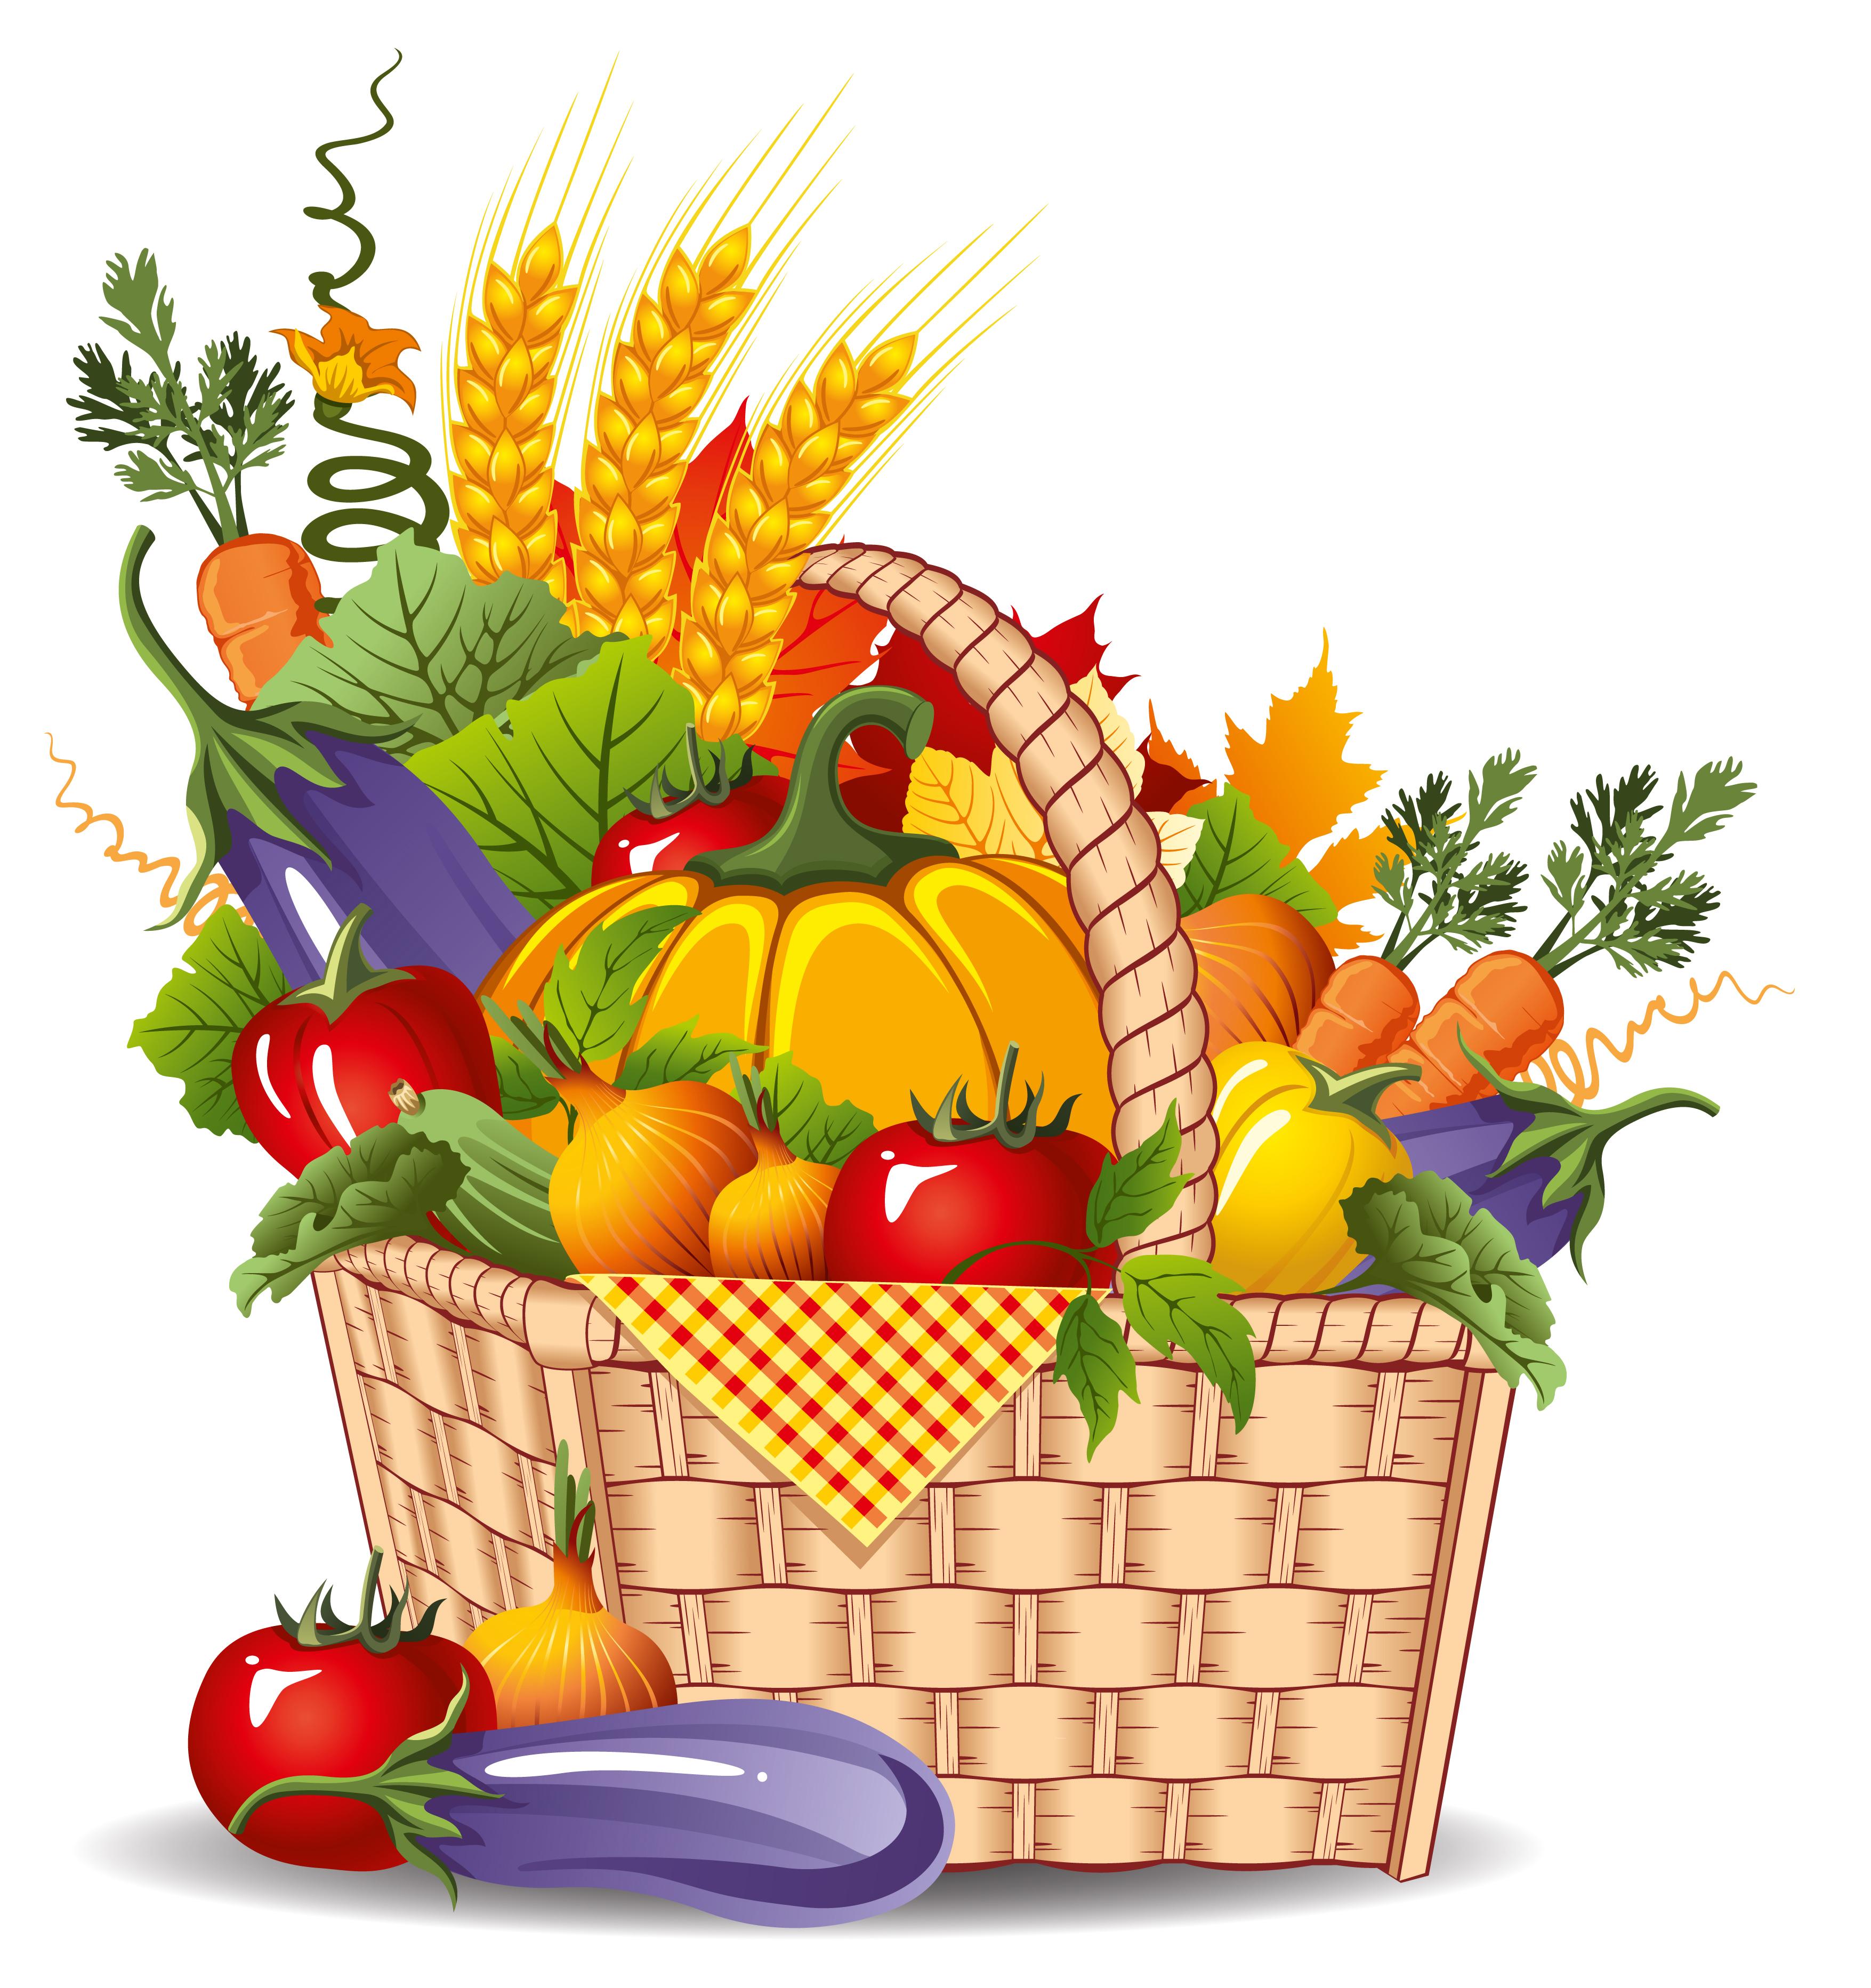 Market fresh vegetables clipart - Clipground